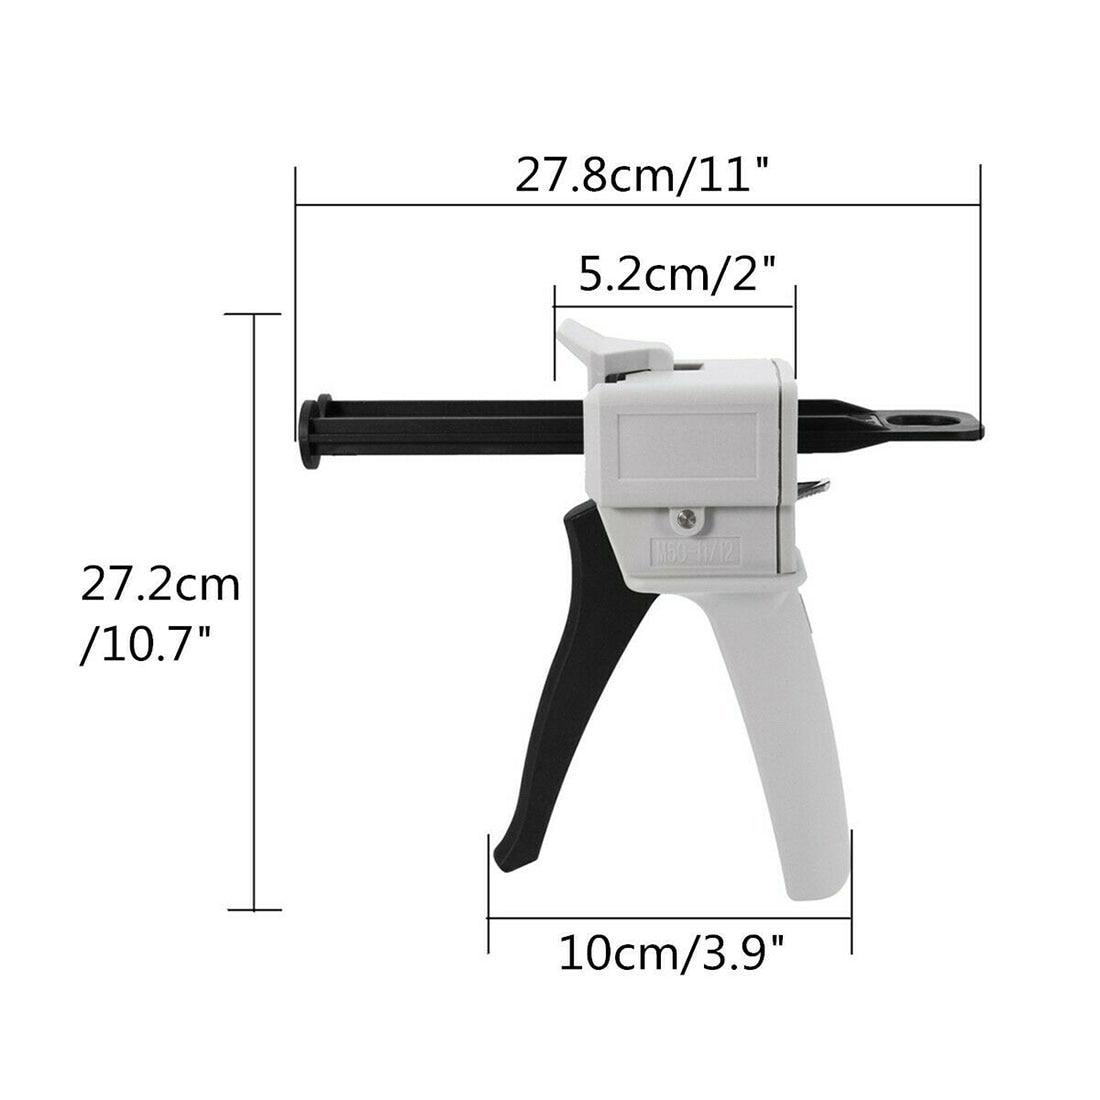 50ml AB Epoxy Sealant Glue Applicator Glue Adhensive Squeeze Mixed 1:1 Manual Caulking Gun Dispenser